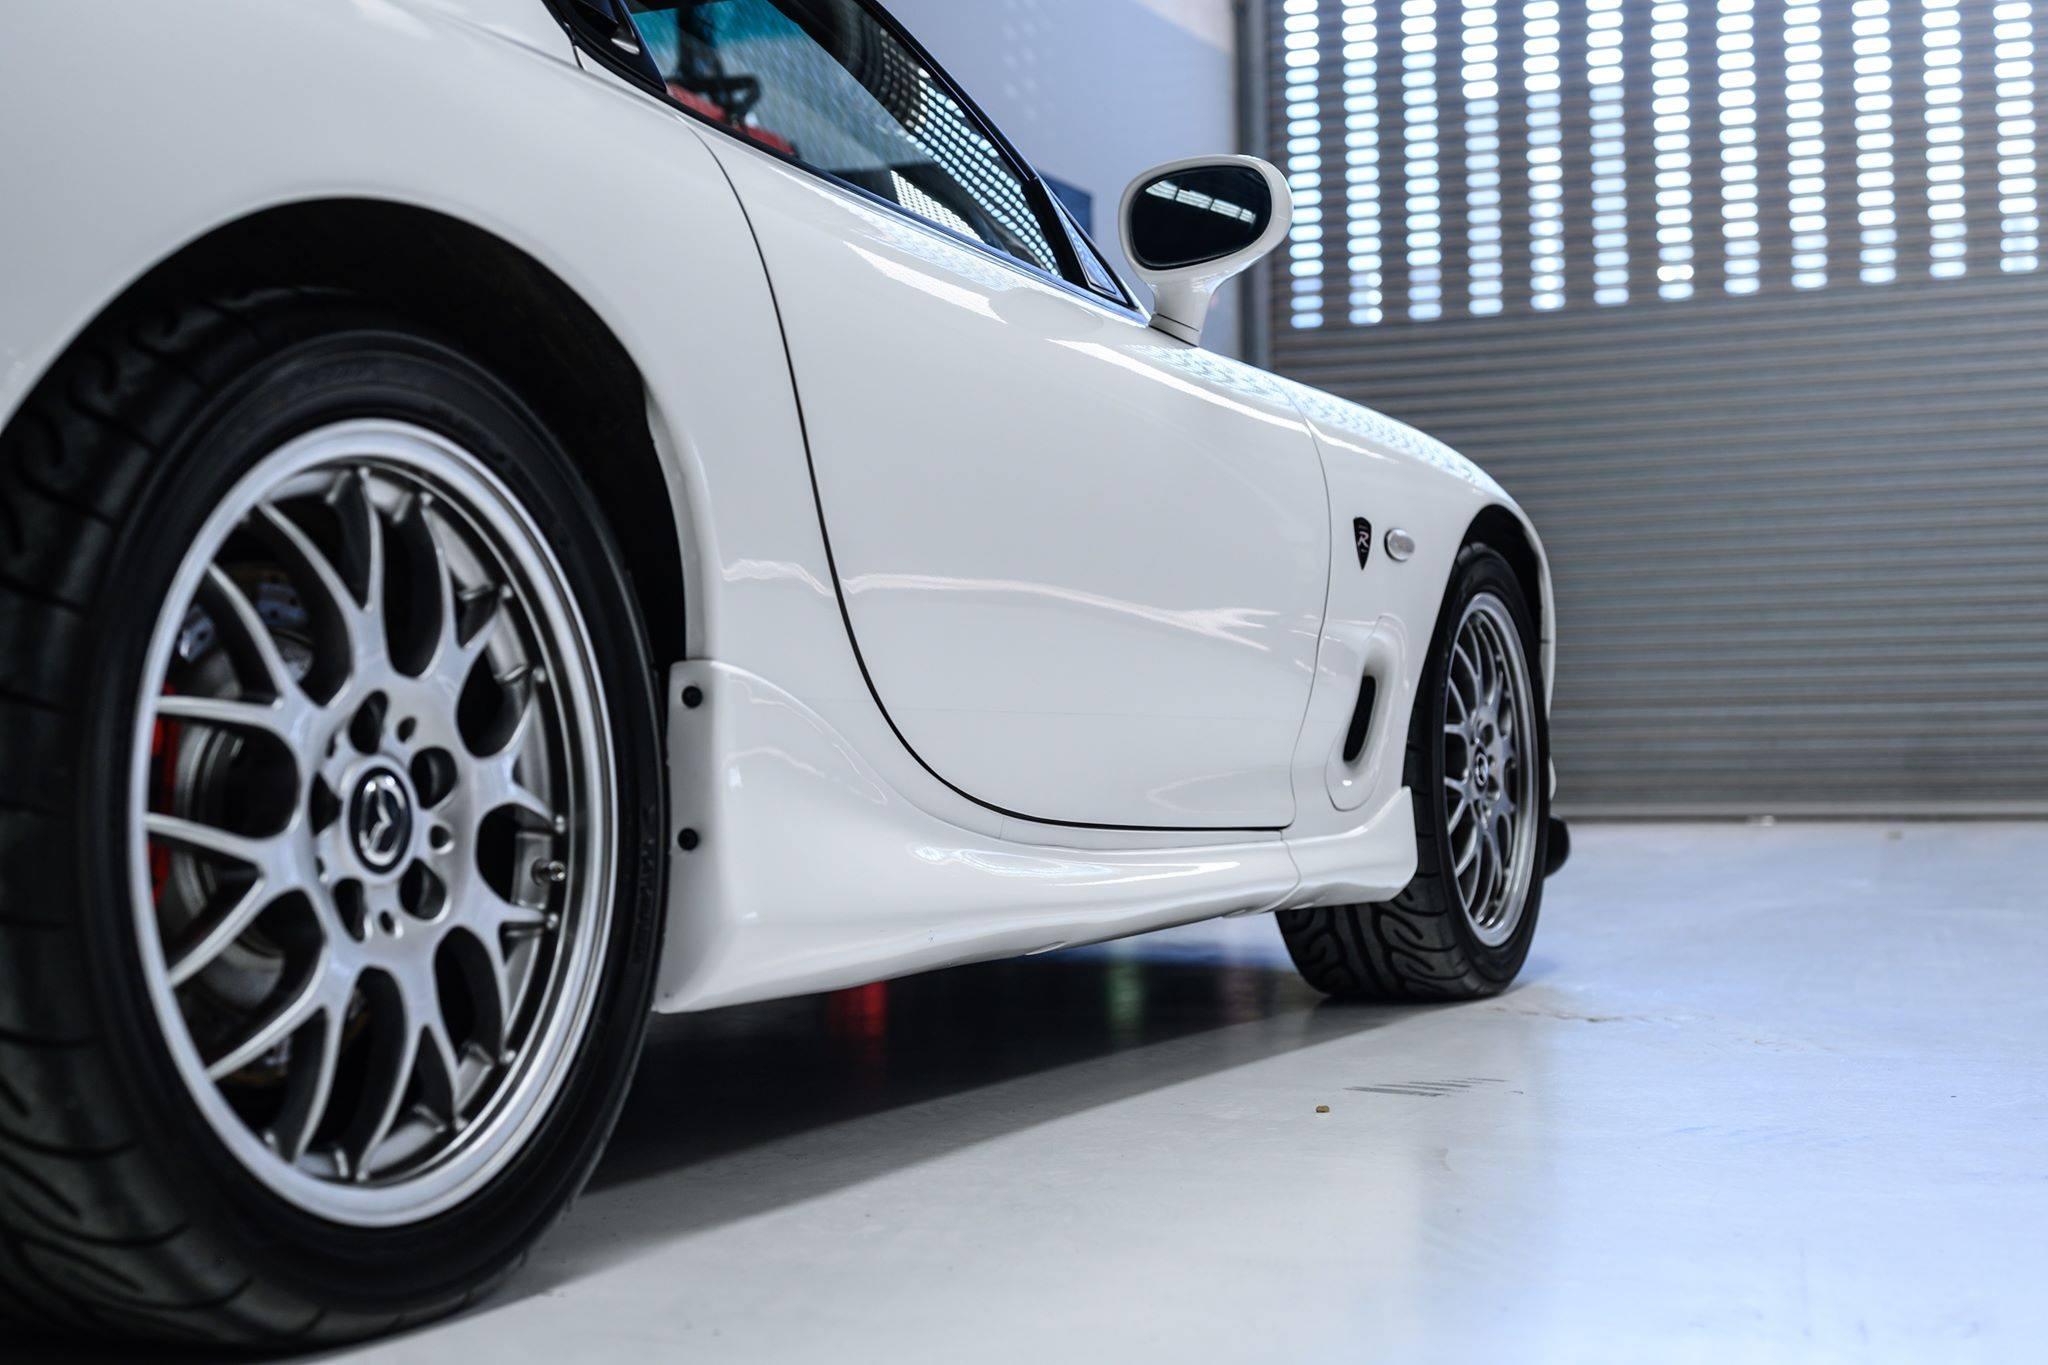 2002_Mazda_RX-7_Spirit-R_Type-A_sale_0014